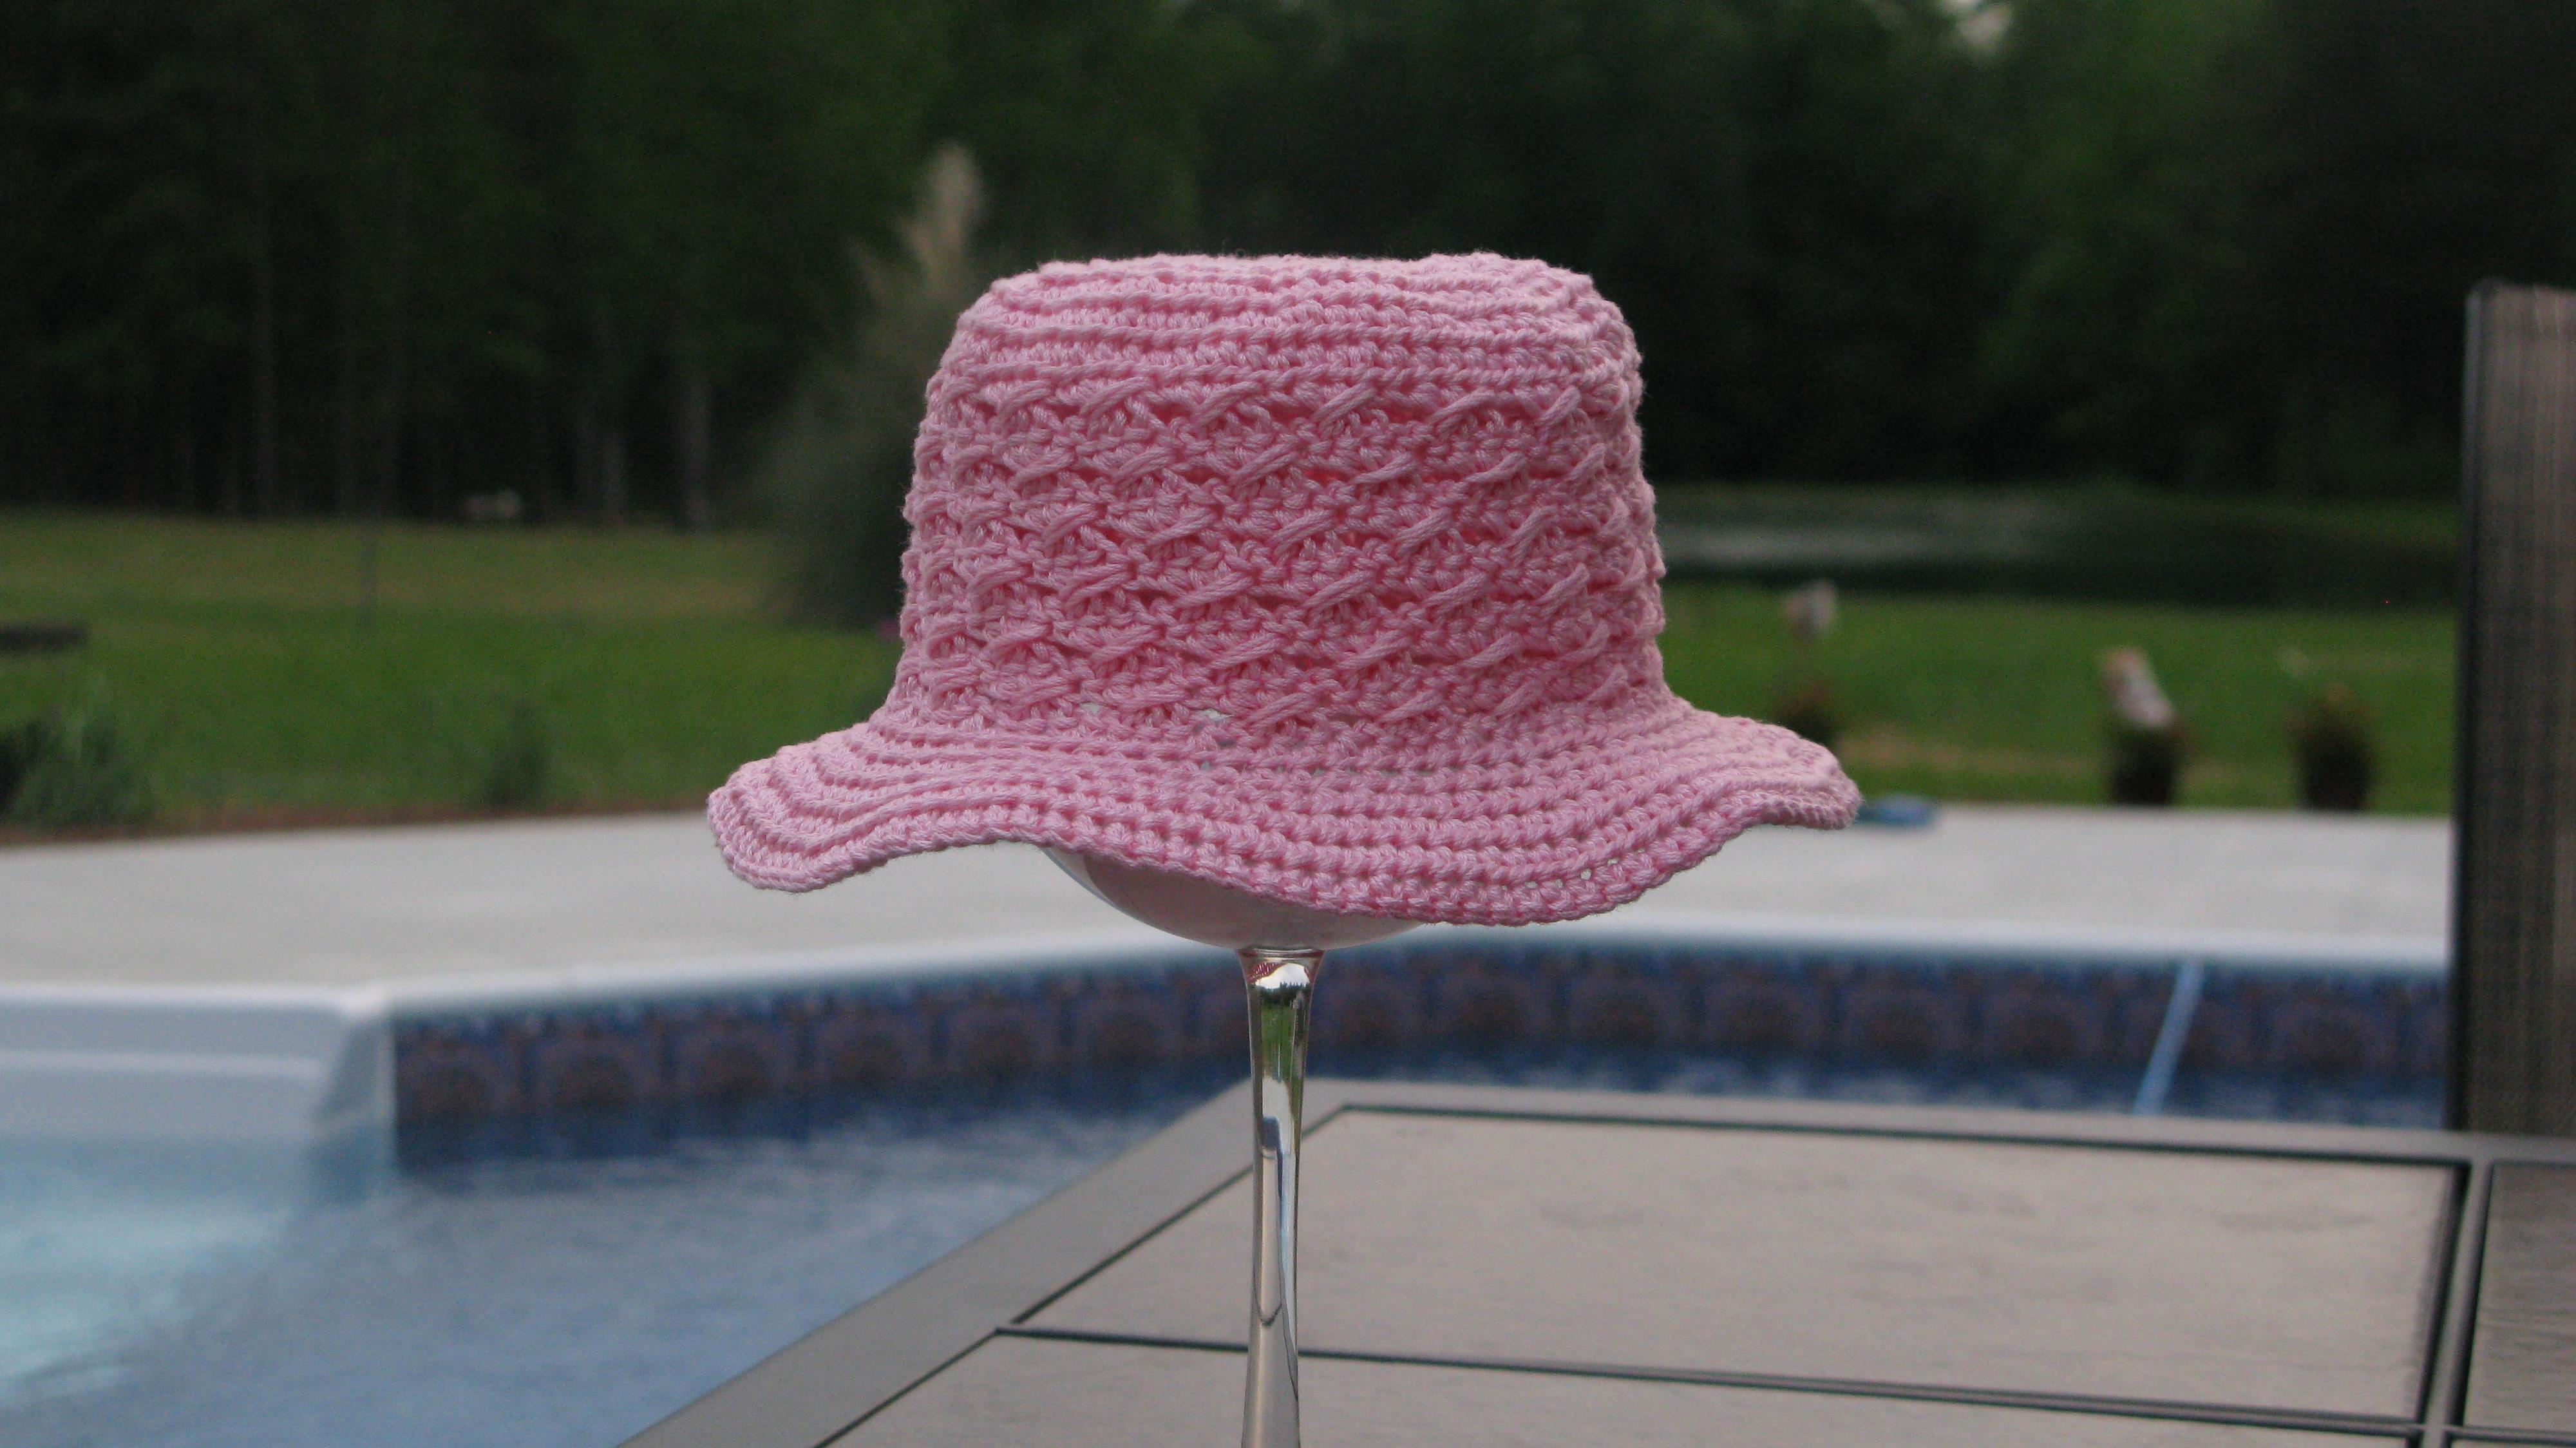 kathy sinfonia Mini Summer Beach Hat